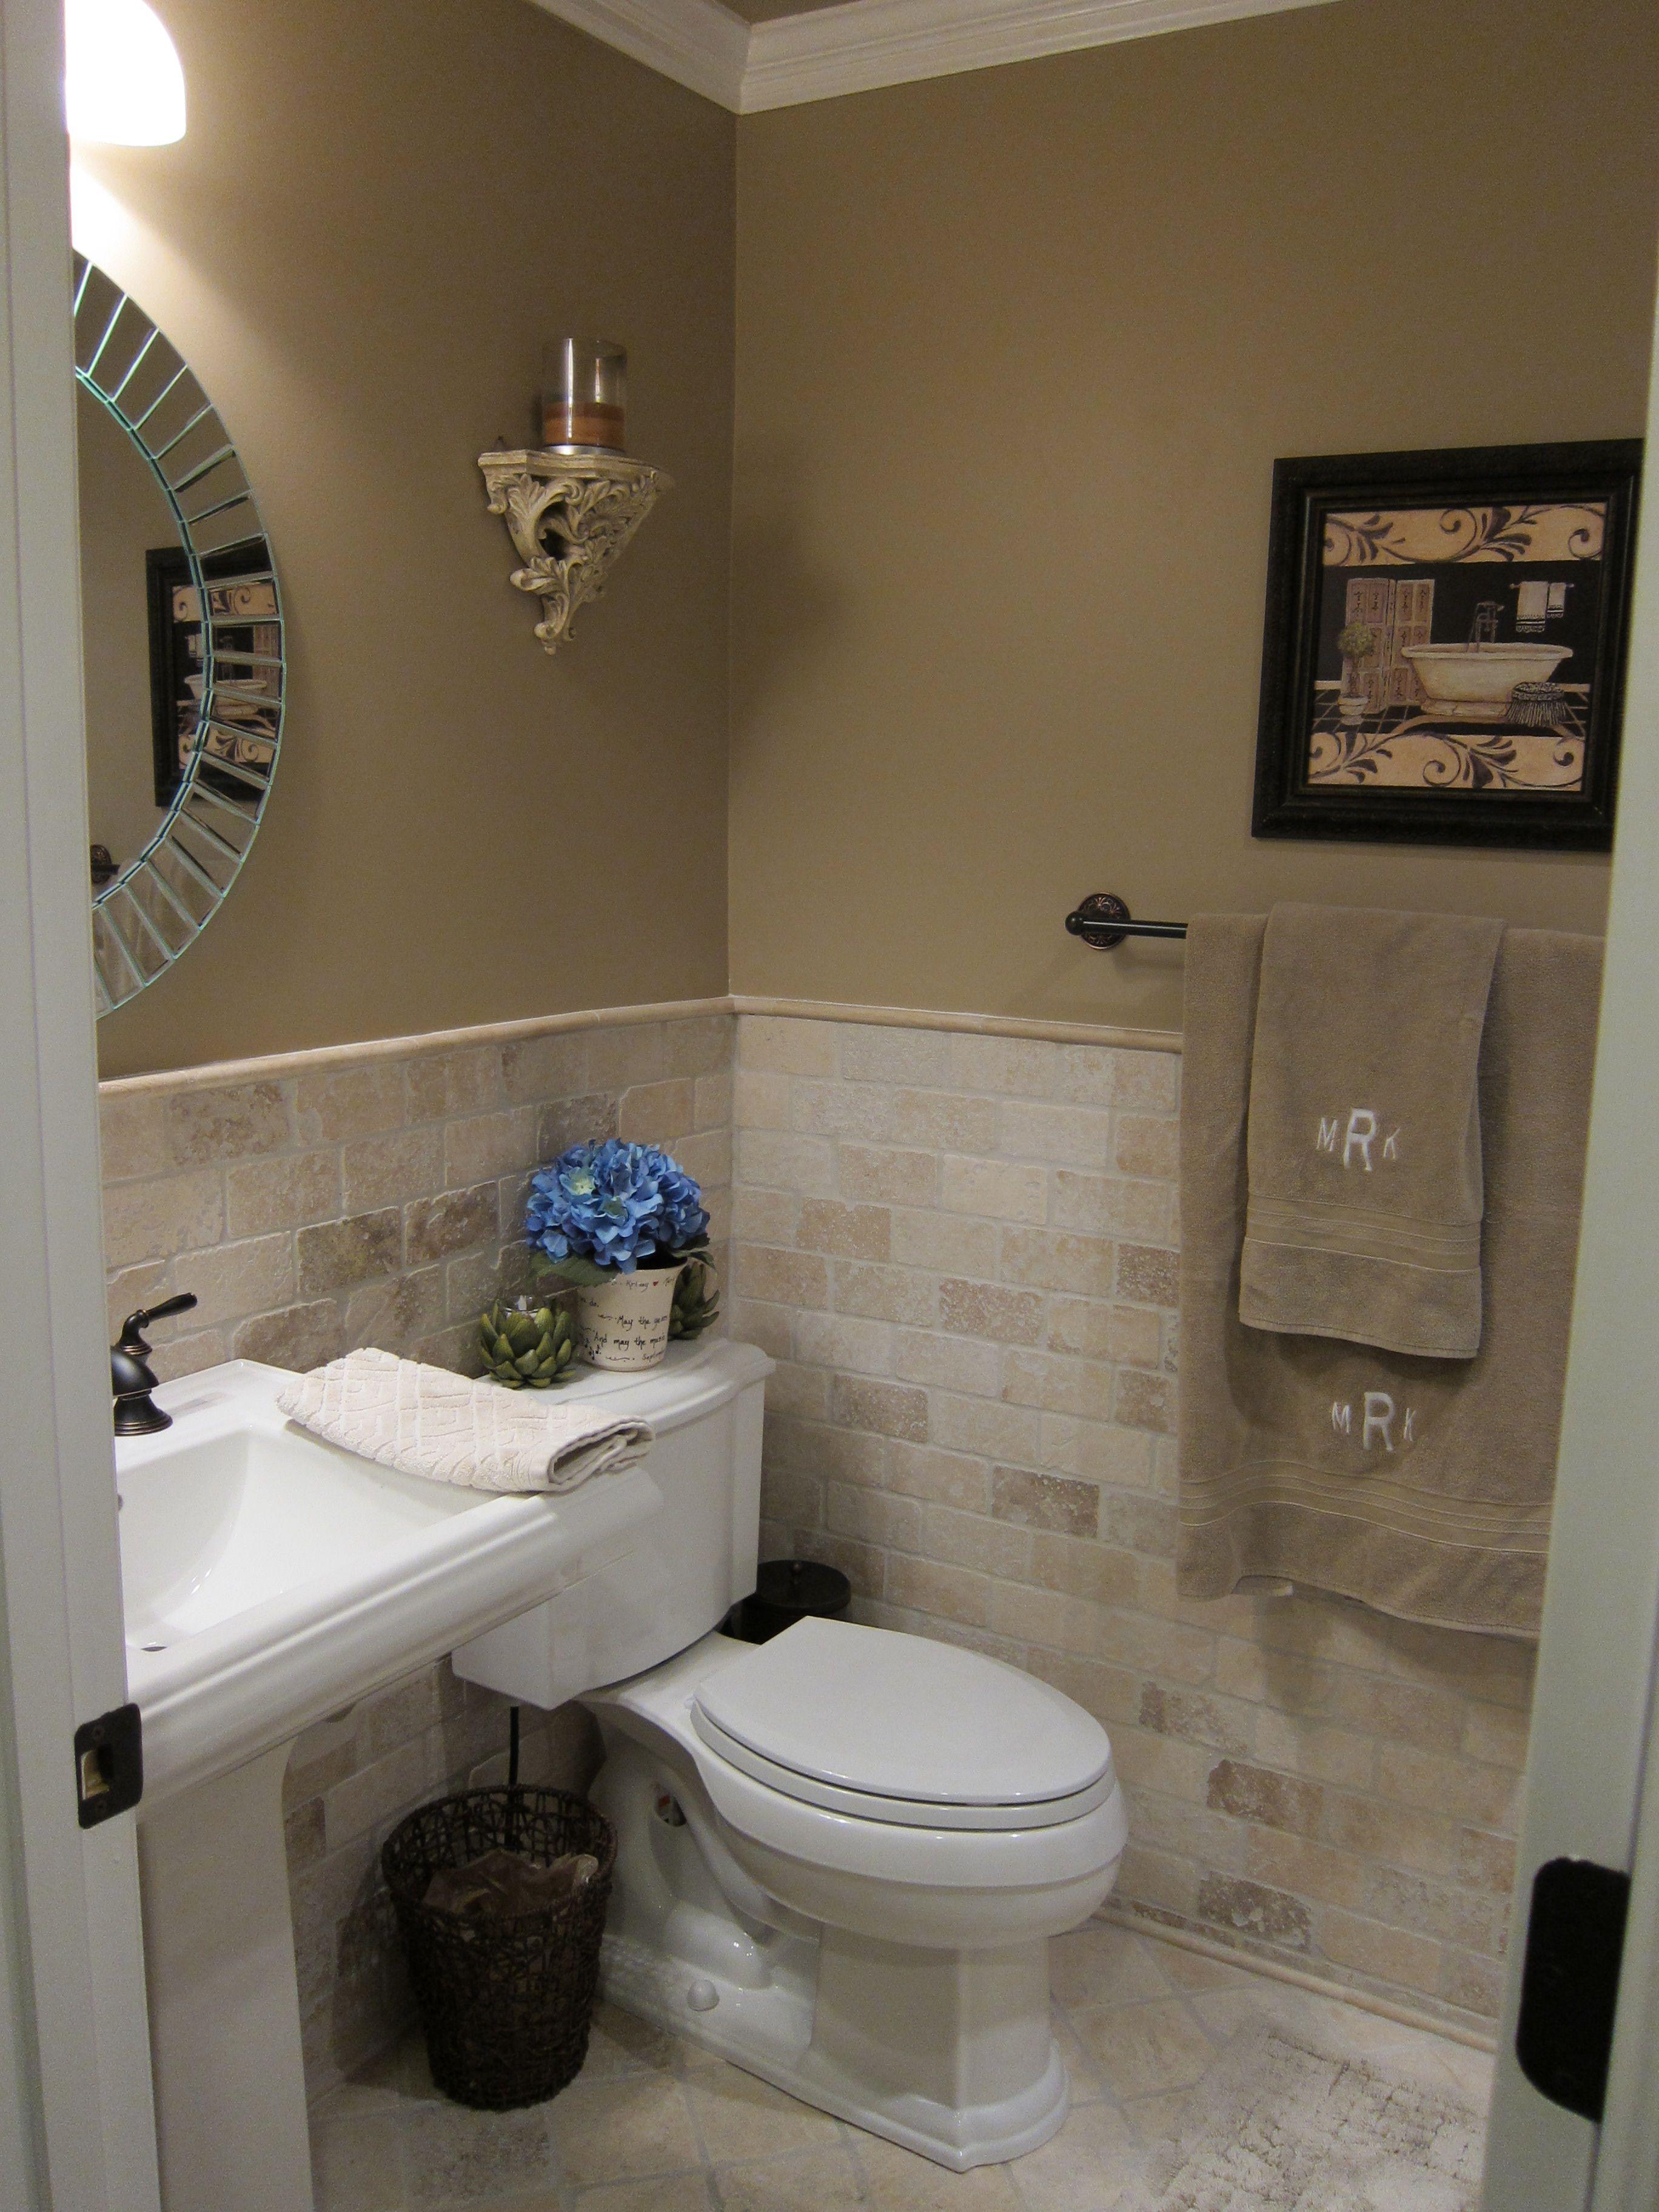 25 Best Bathroom Tiles Design Ideas You Never Knew You Wanted Diseno Banos Pequenos Banos Interiores Decorar Banos